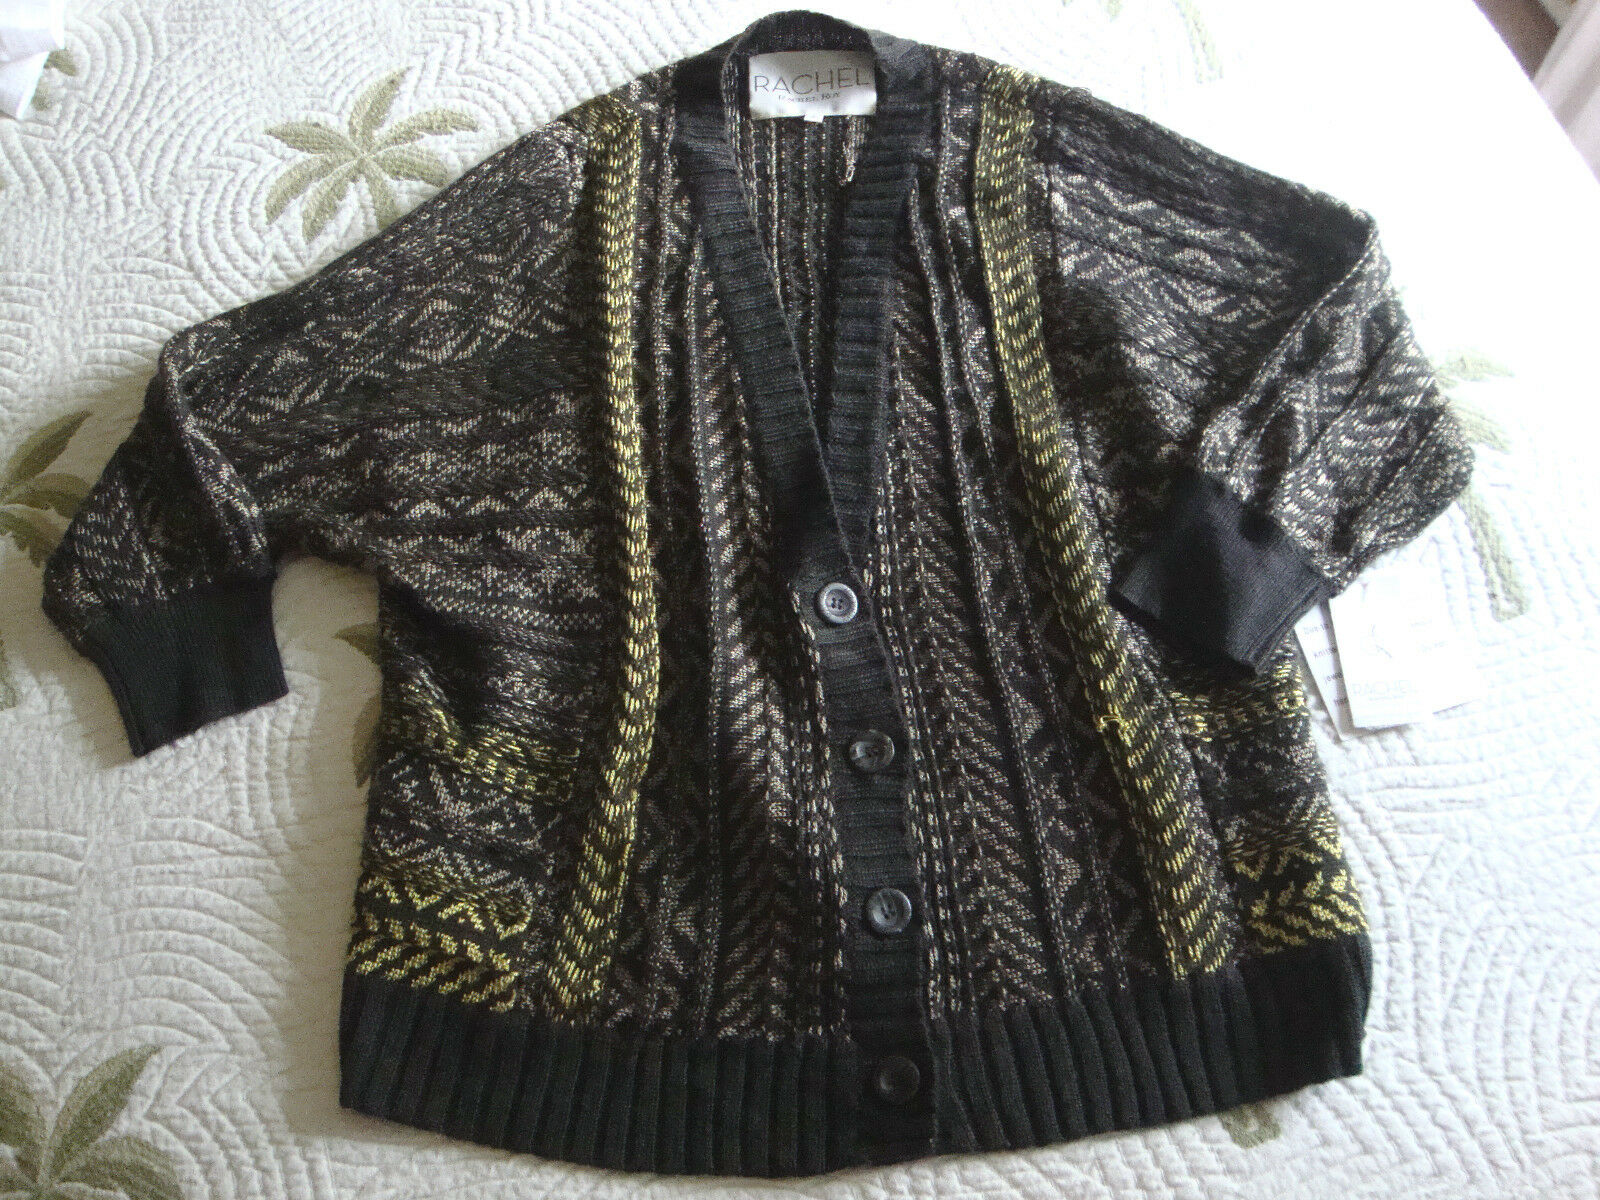 New Womens Rachel Roy Magic Carpet Knit Mushroom Button Down Sweater Size Small